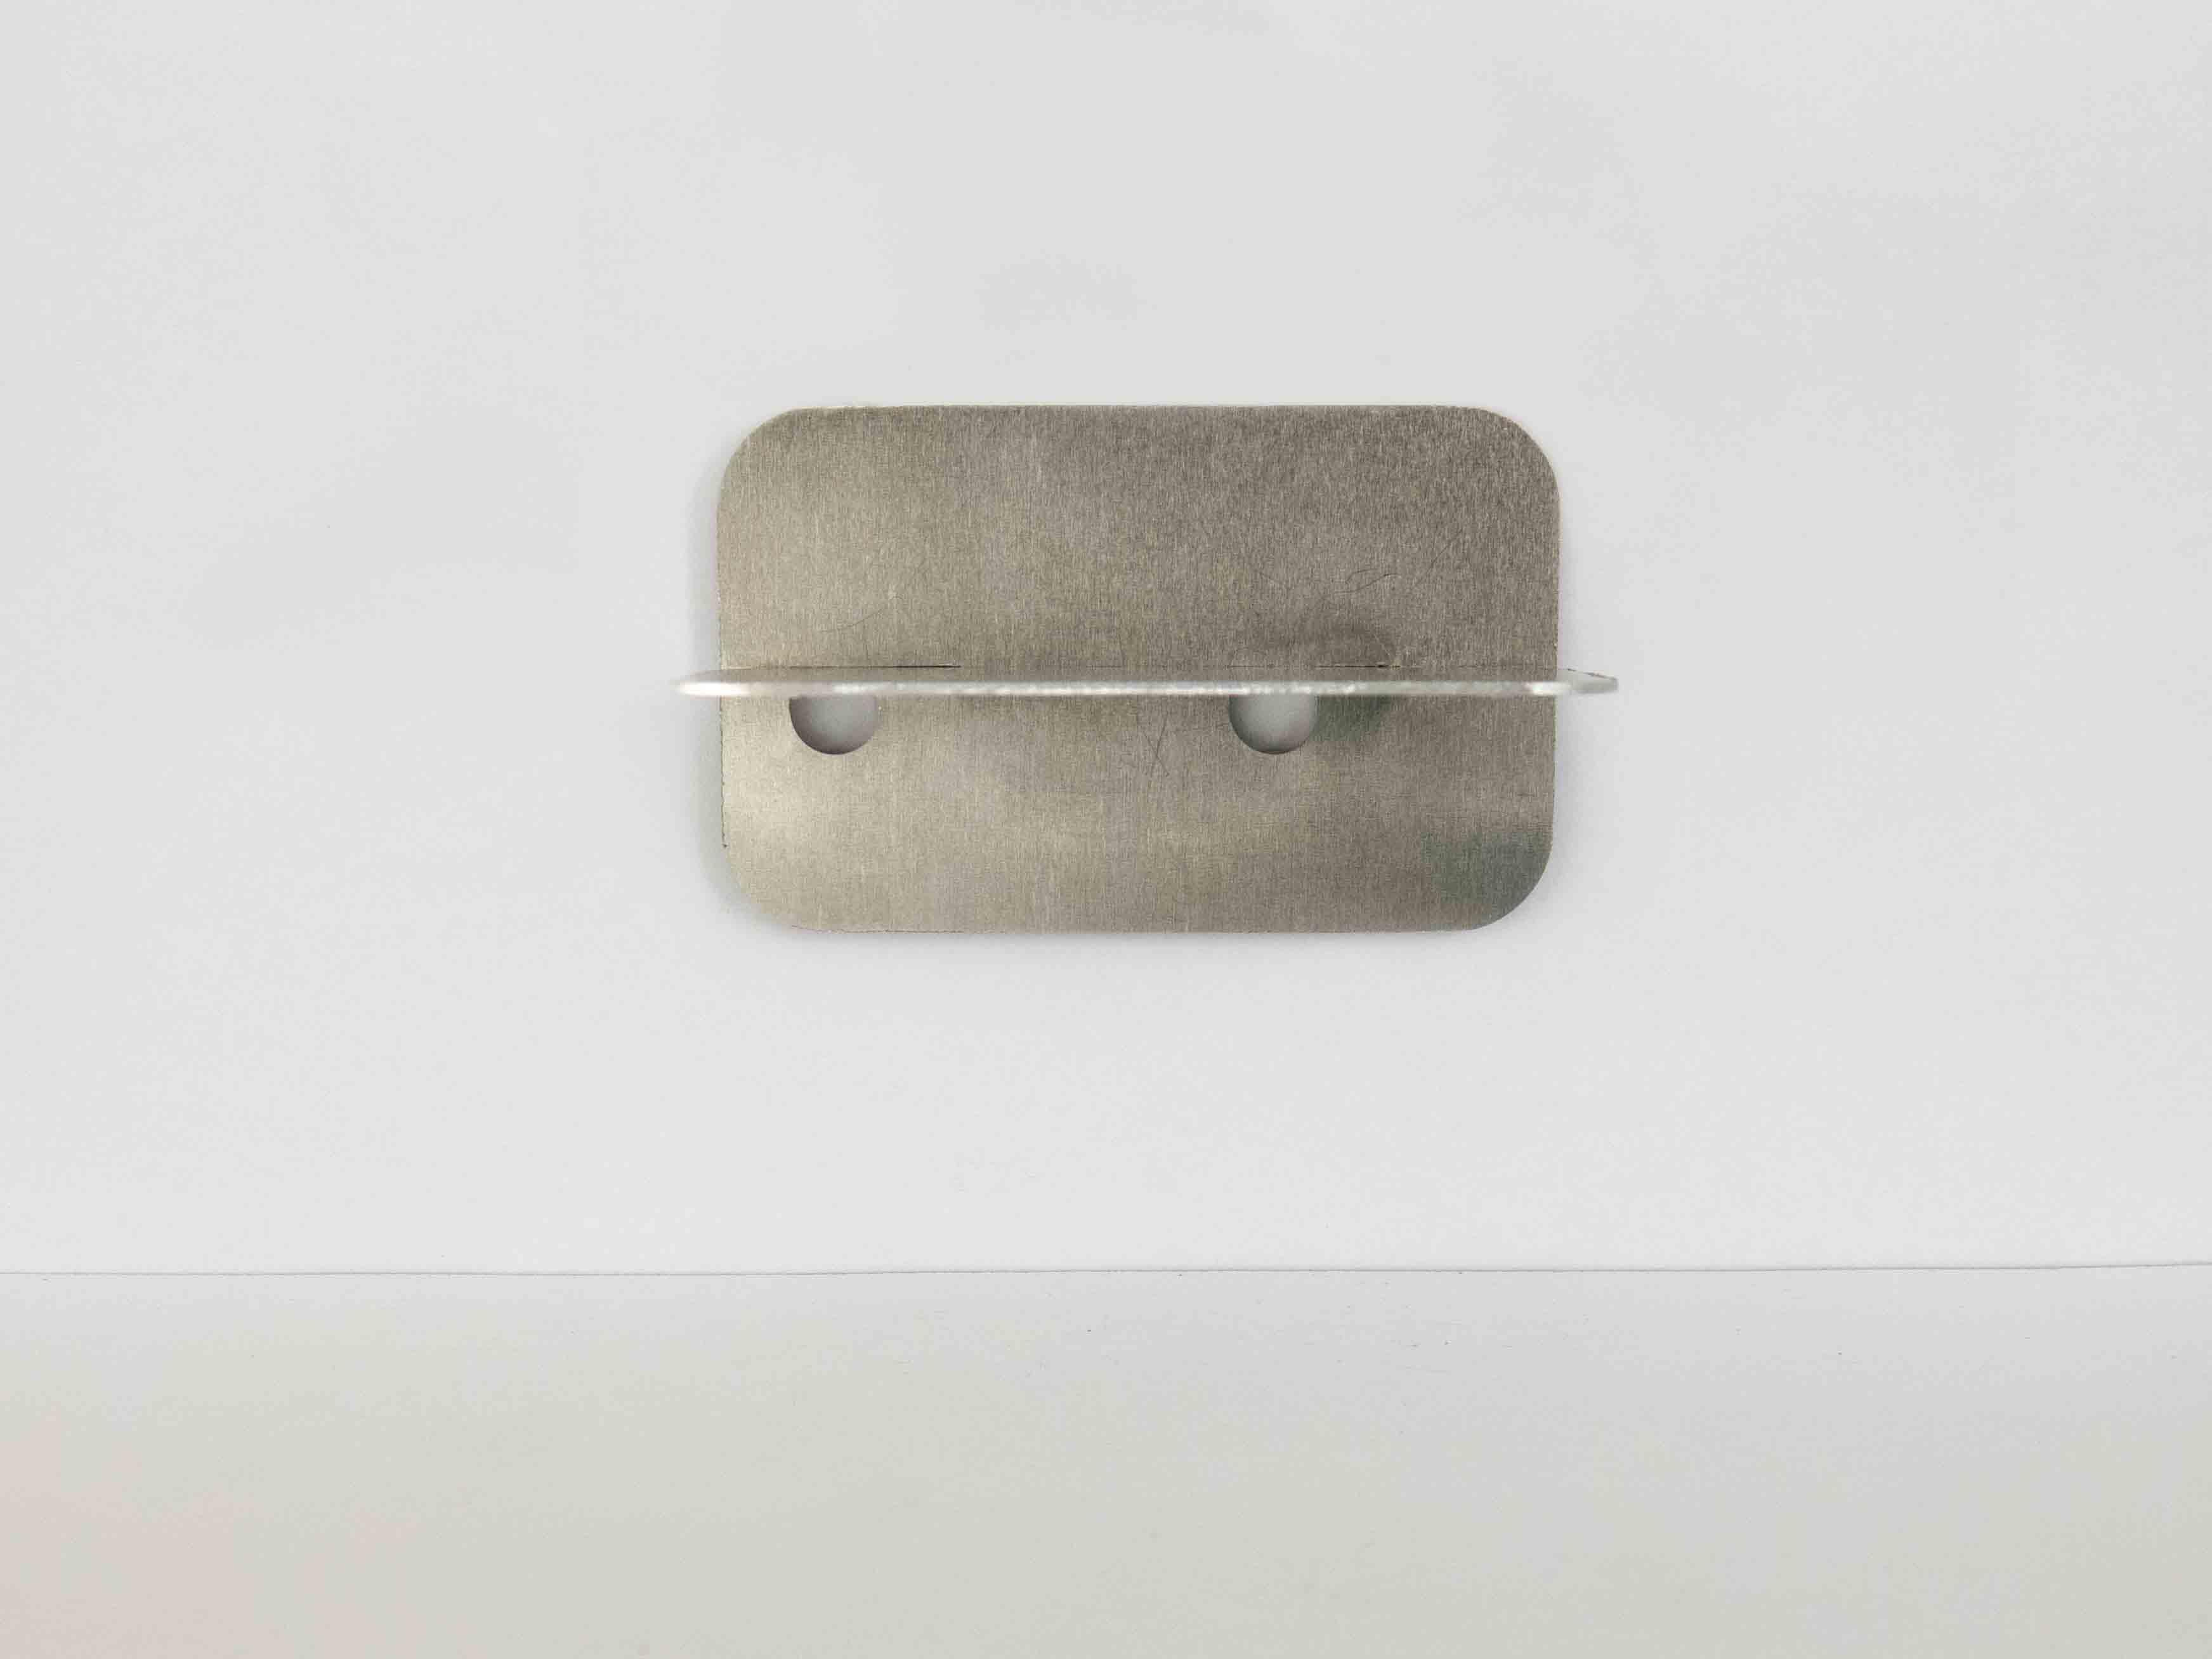 laser cut metal fastening clips wall